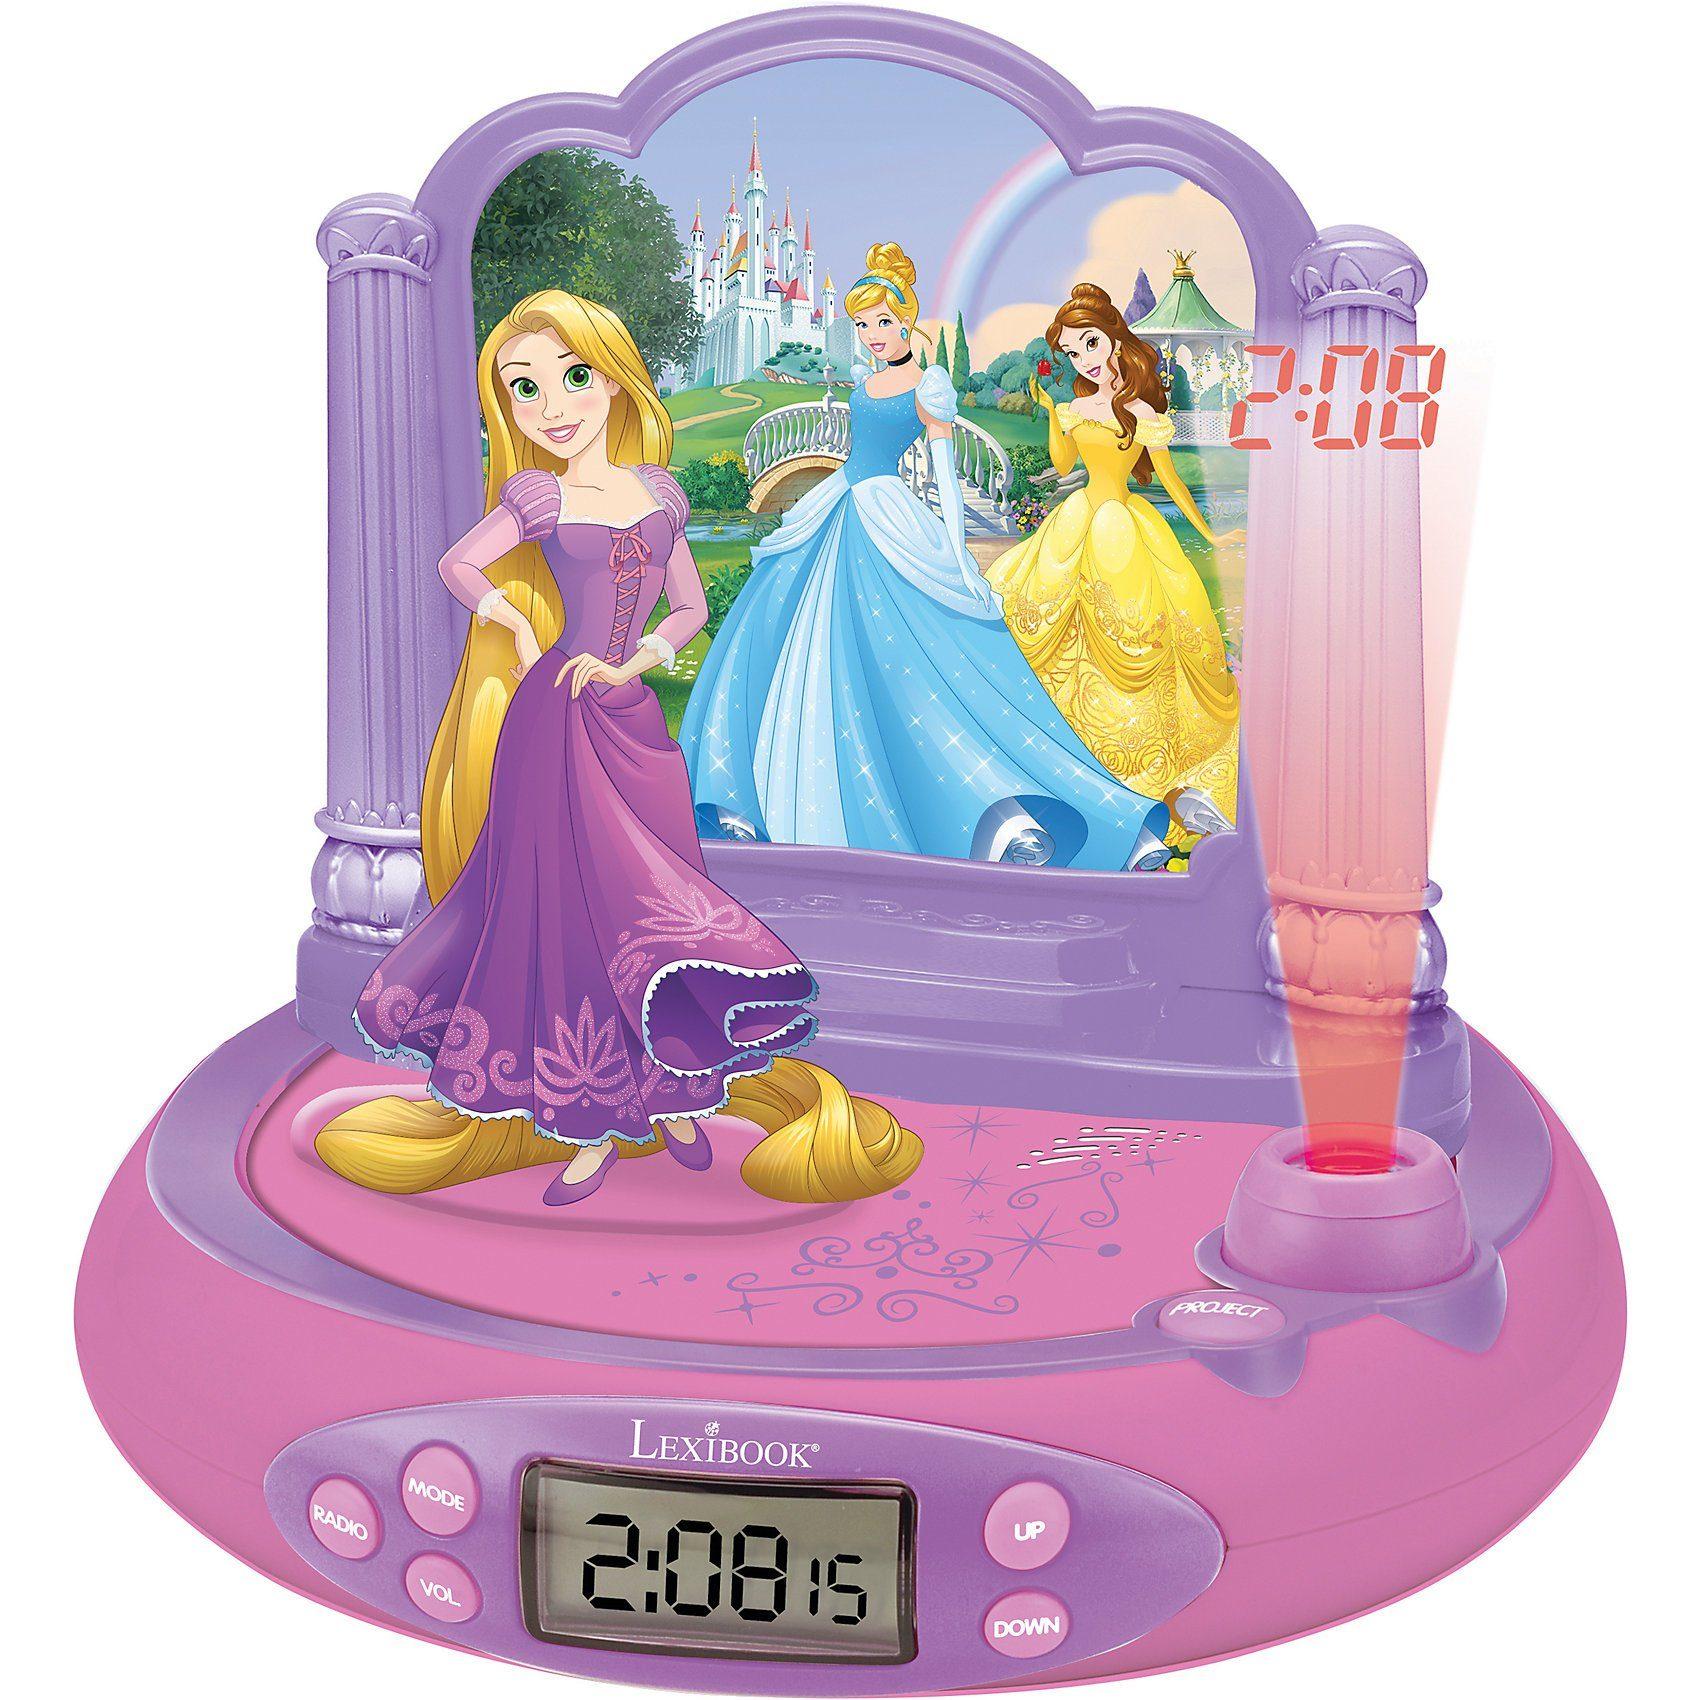 Lexibook® Disney Princess Radiowecker mit Projektion